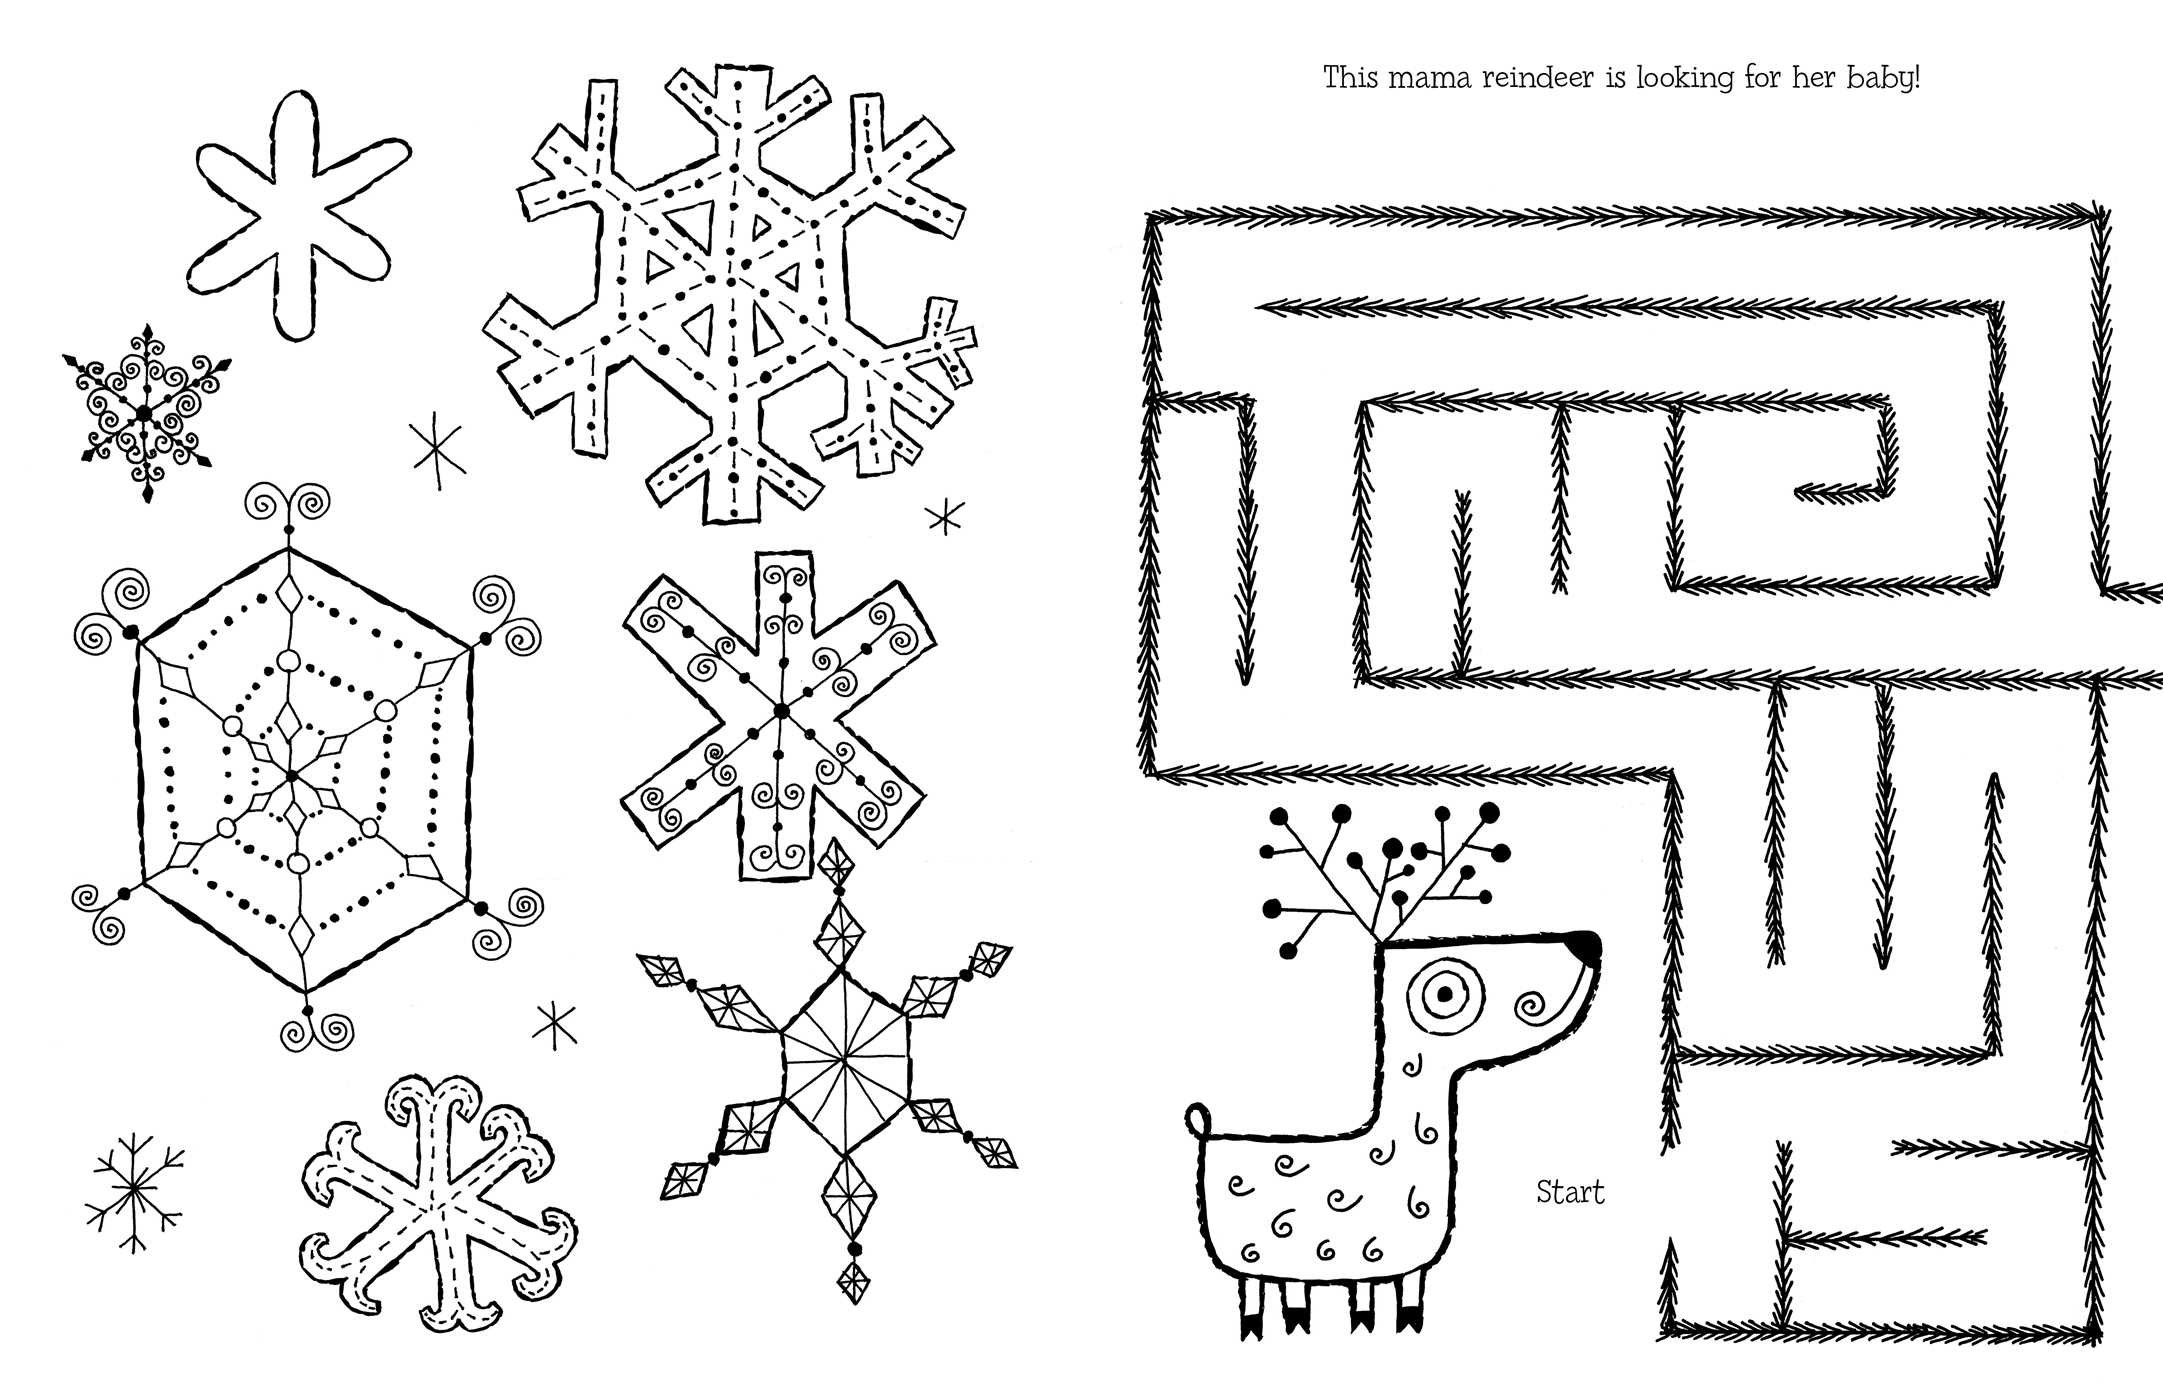 Dream doodle draw make believe magic 9781481462914.in04